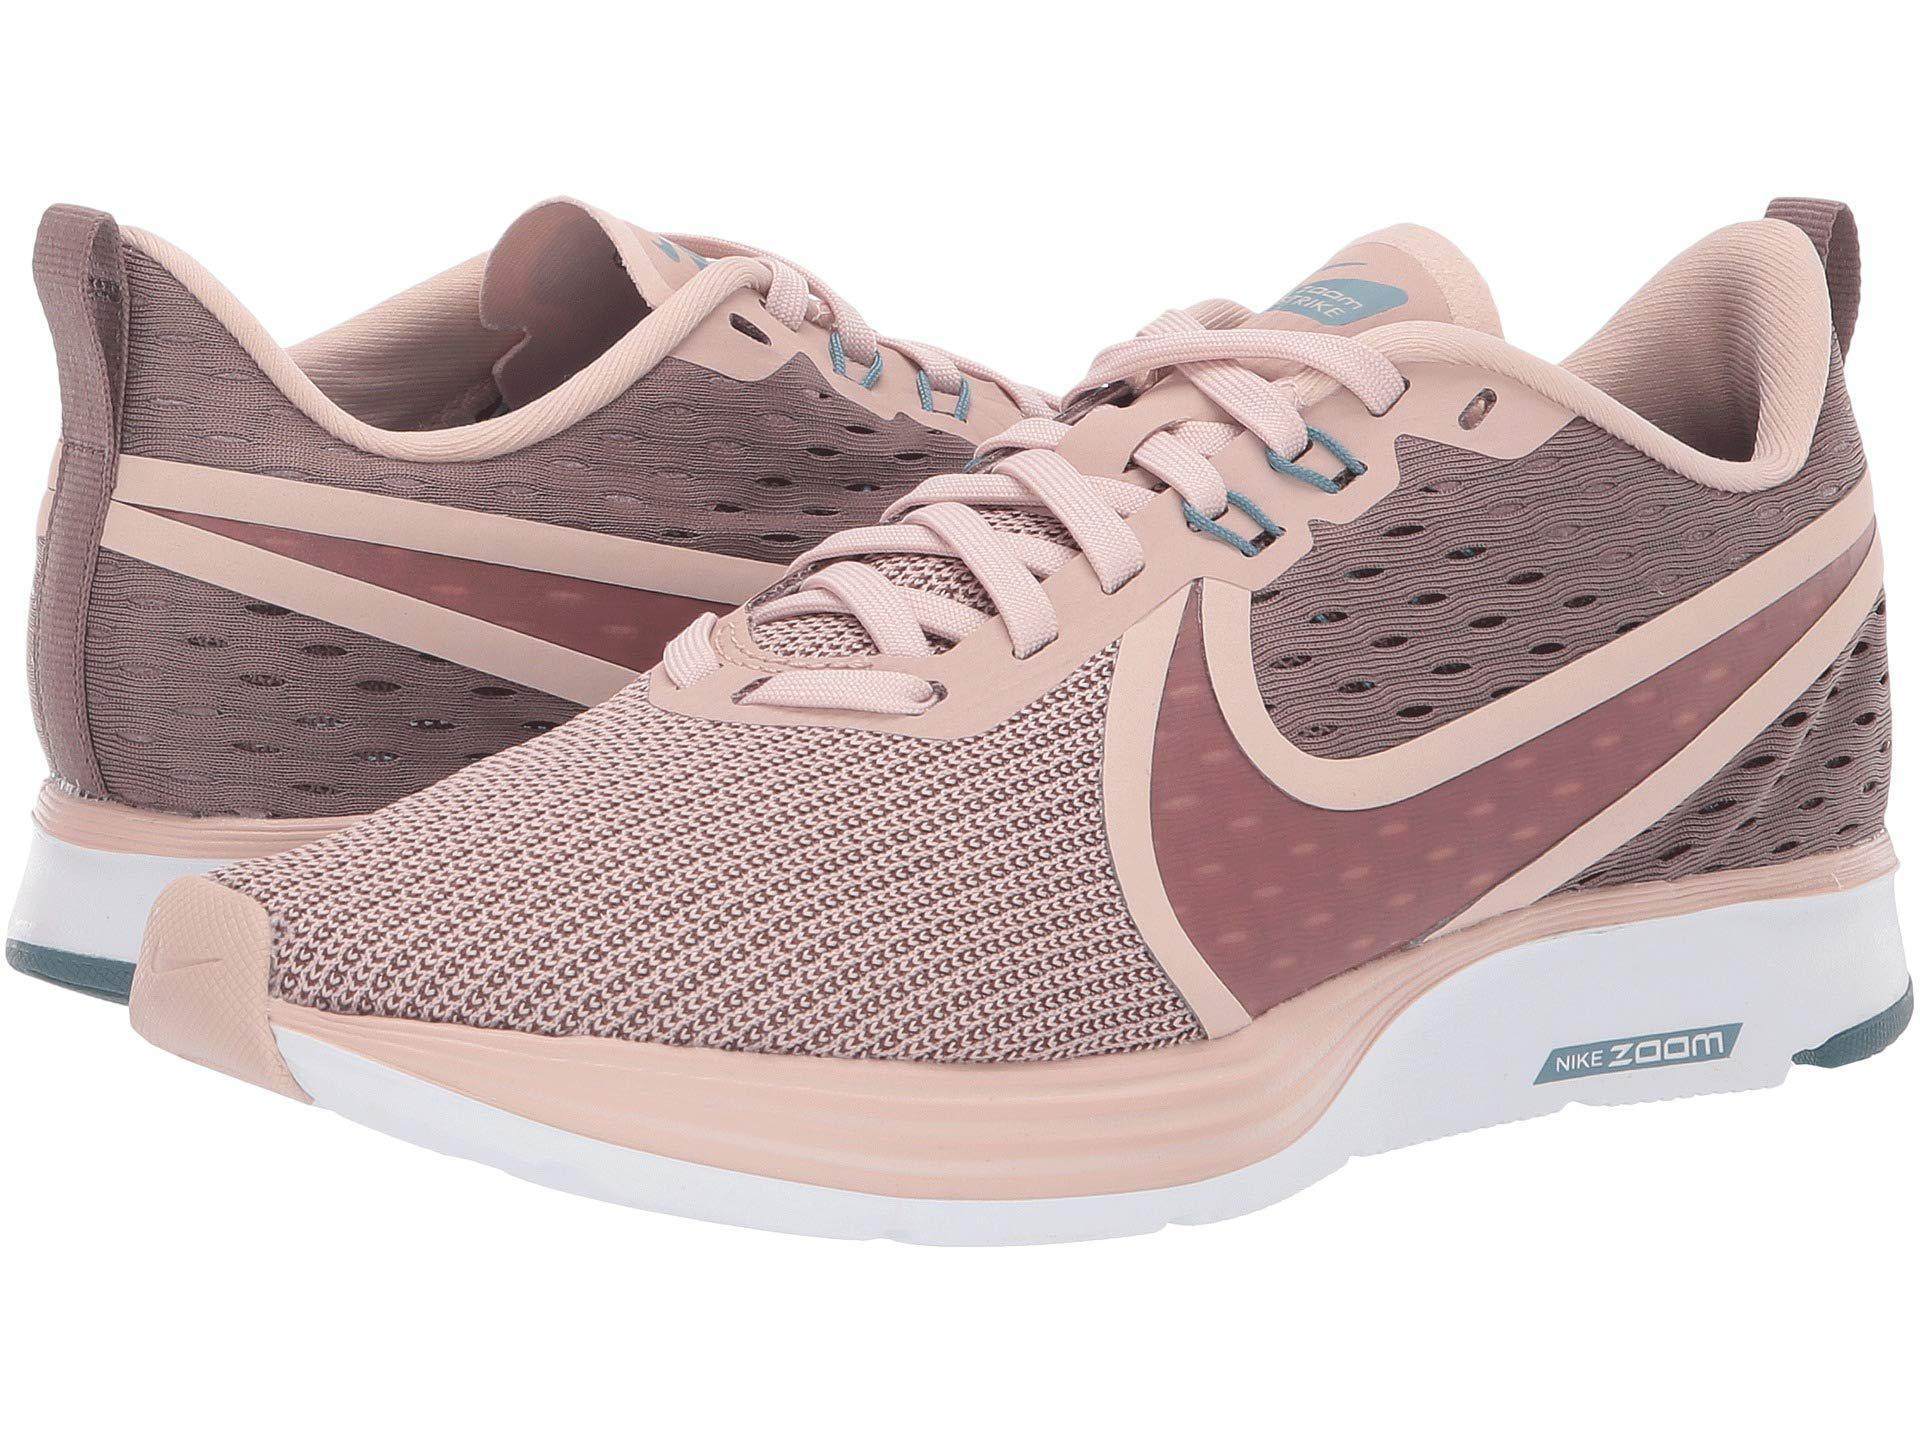 00469c1d8b4b1f Lyst - Nike Zoom Strike 2 (black anthracite white) Women s Running Shoes